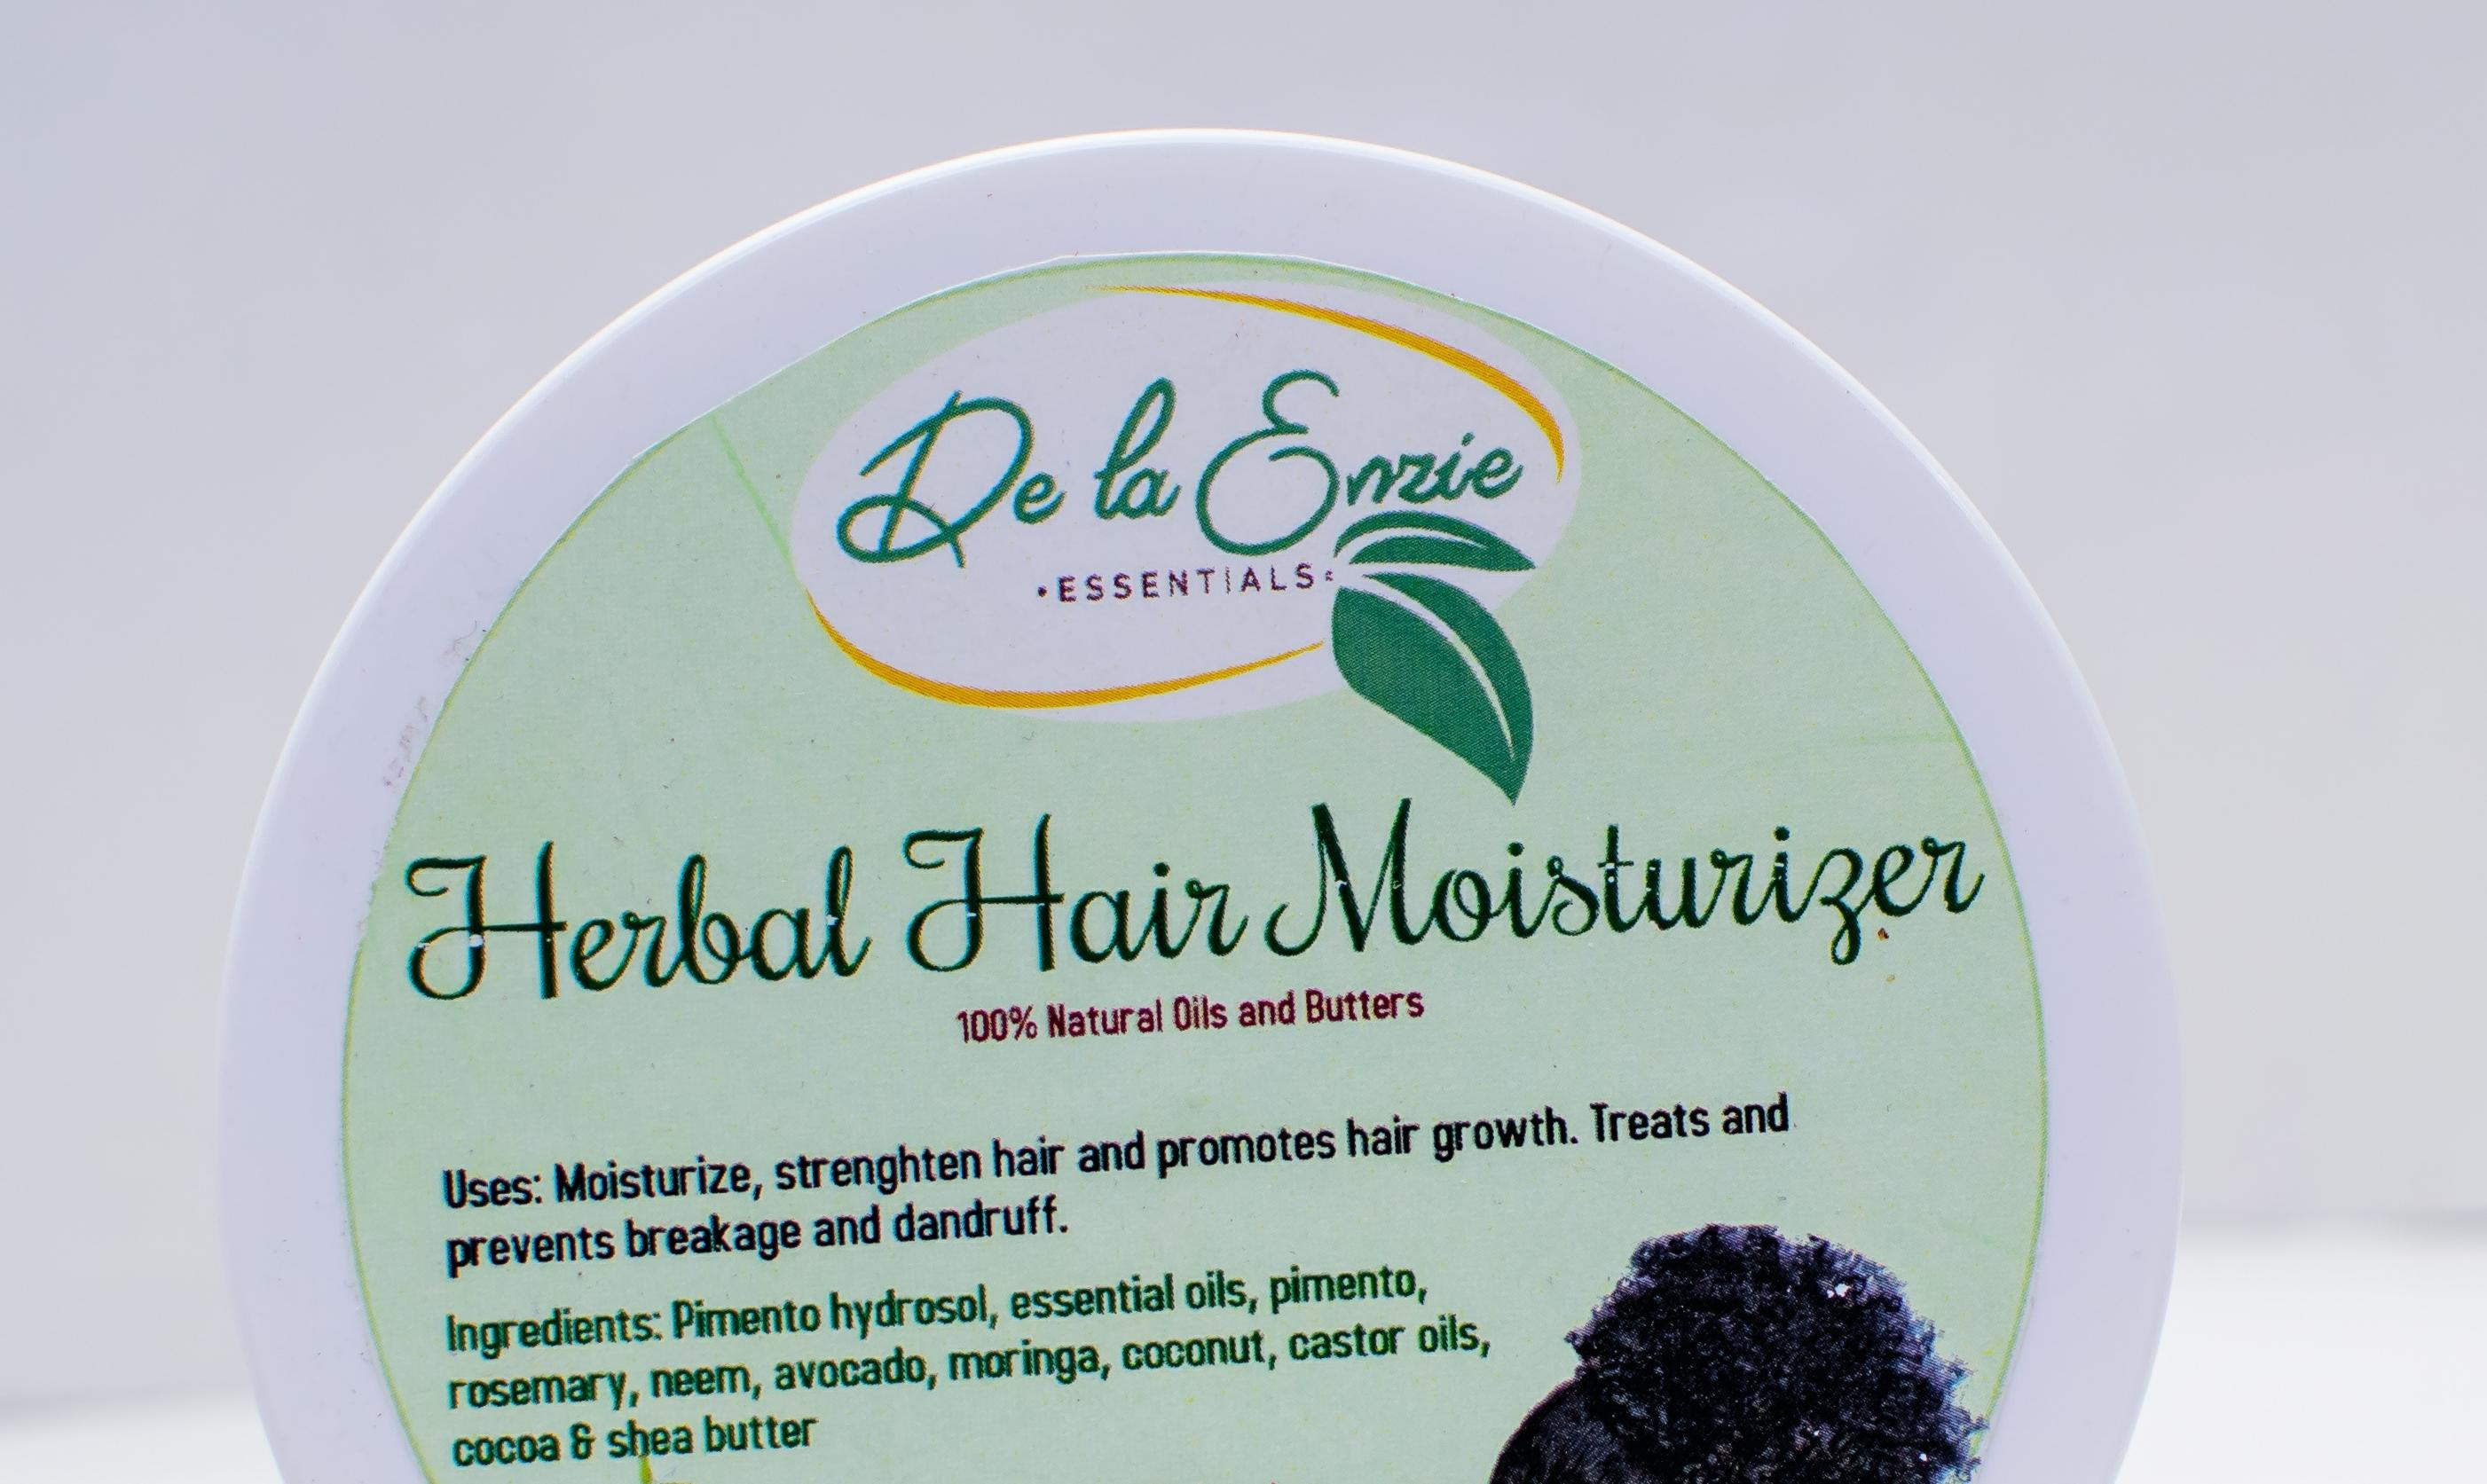 Herbal Hair Moisturizer